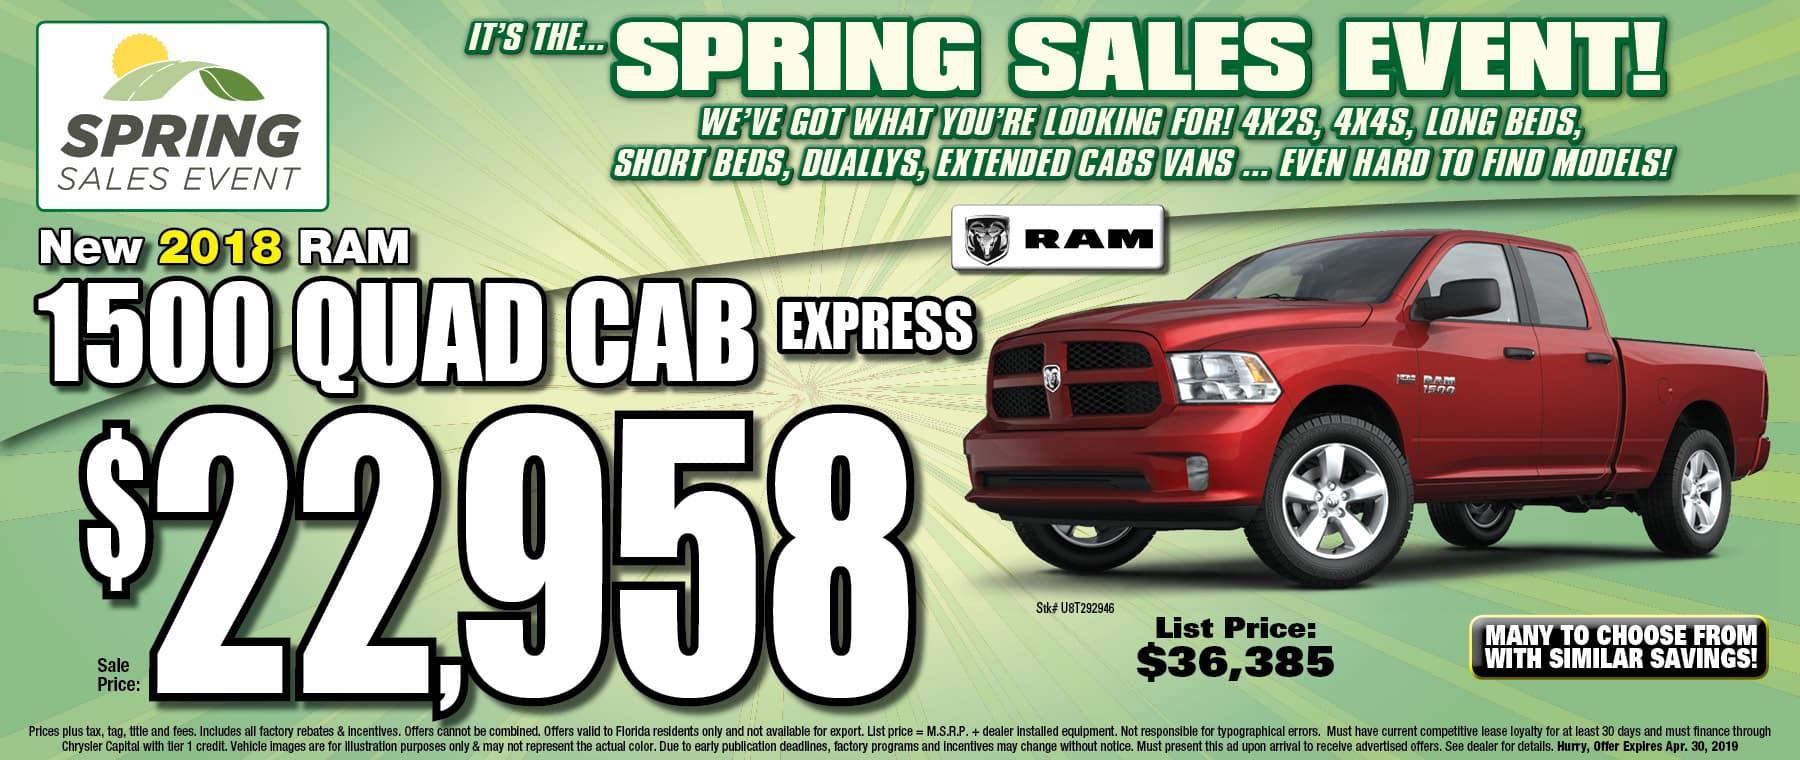 RAM Quad Cab Express Trucks! - At University Dodge RAM!